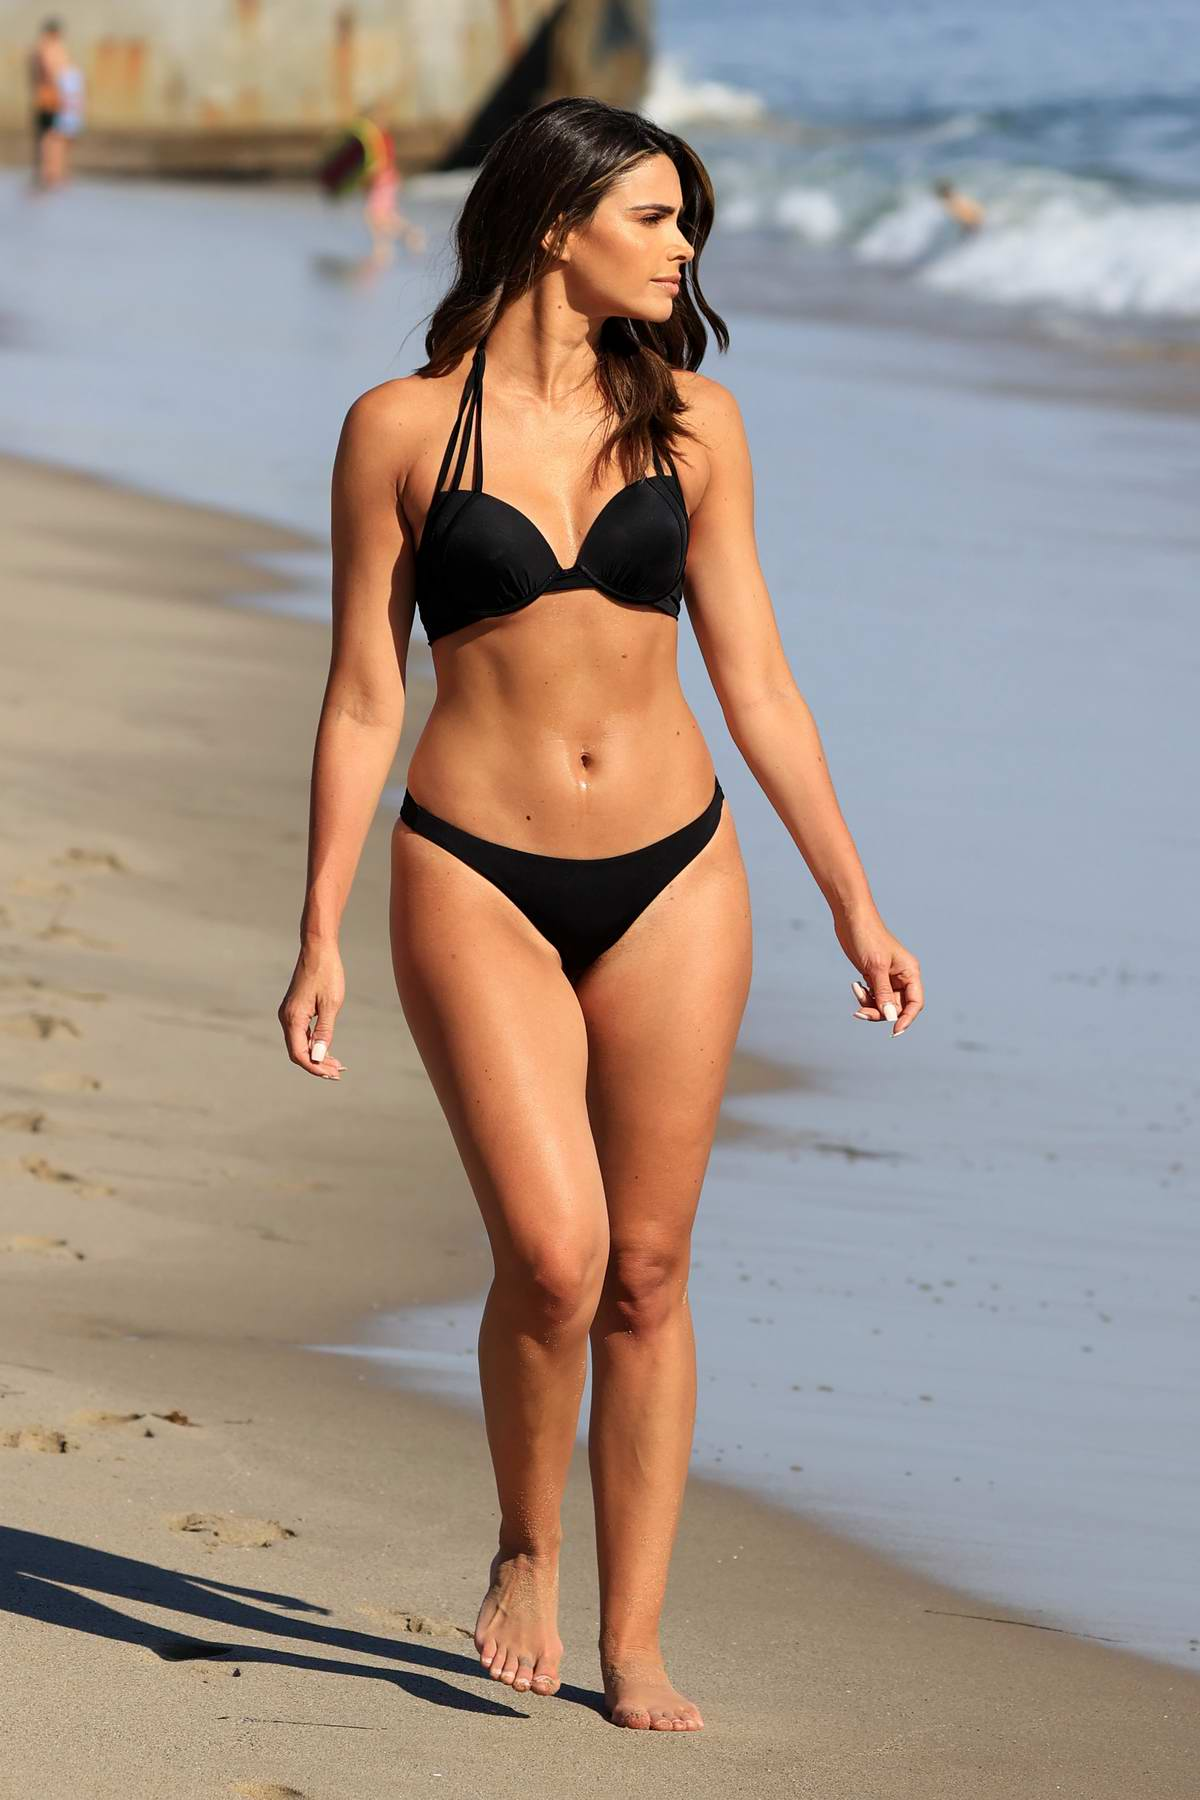 Jennifer Lahmers stuns in a black bikini while enjoying a beach day in Santa Monica, California